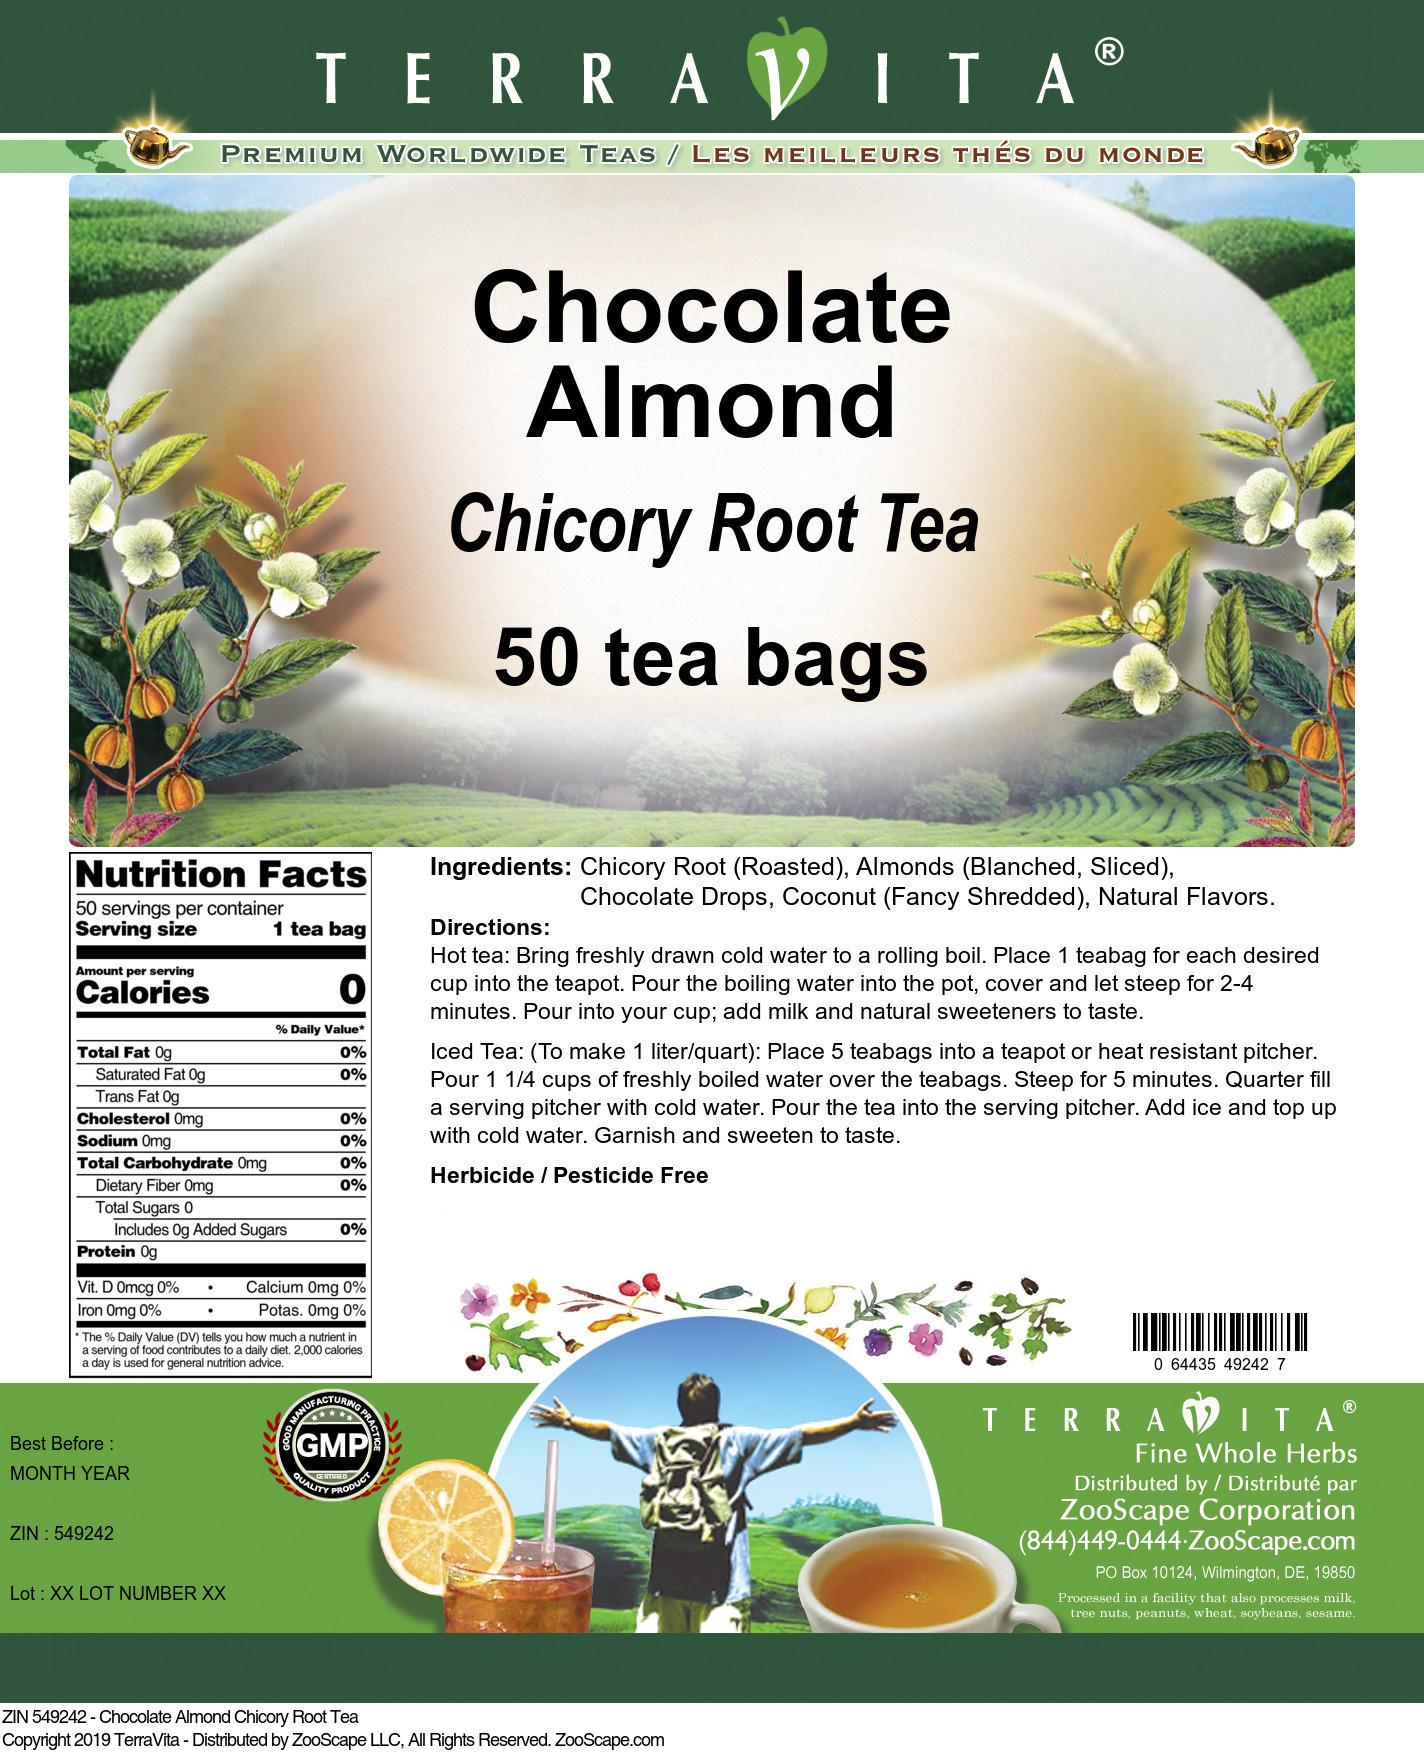 Chocolate Almond Chicory Root